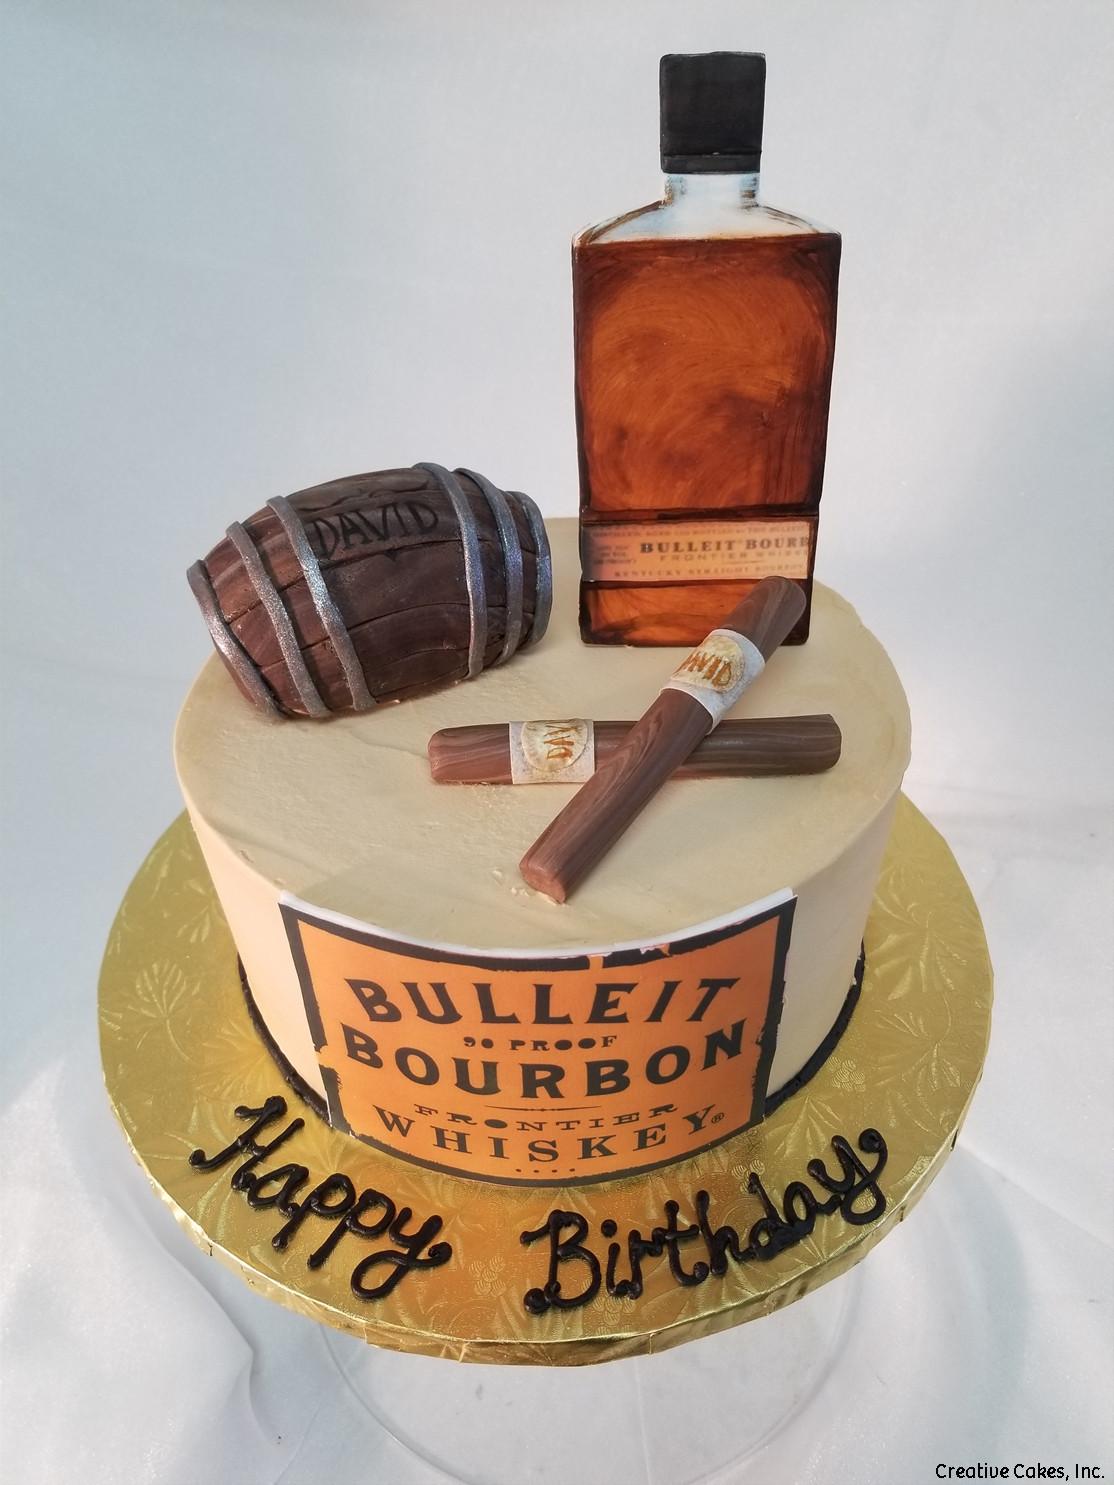 Food 29 Bourbon and Cigars Birthday Cake